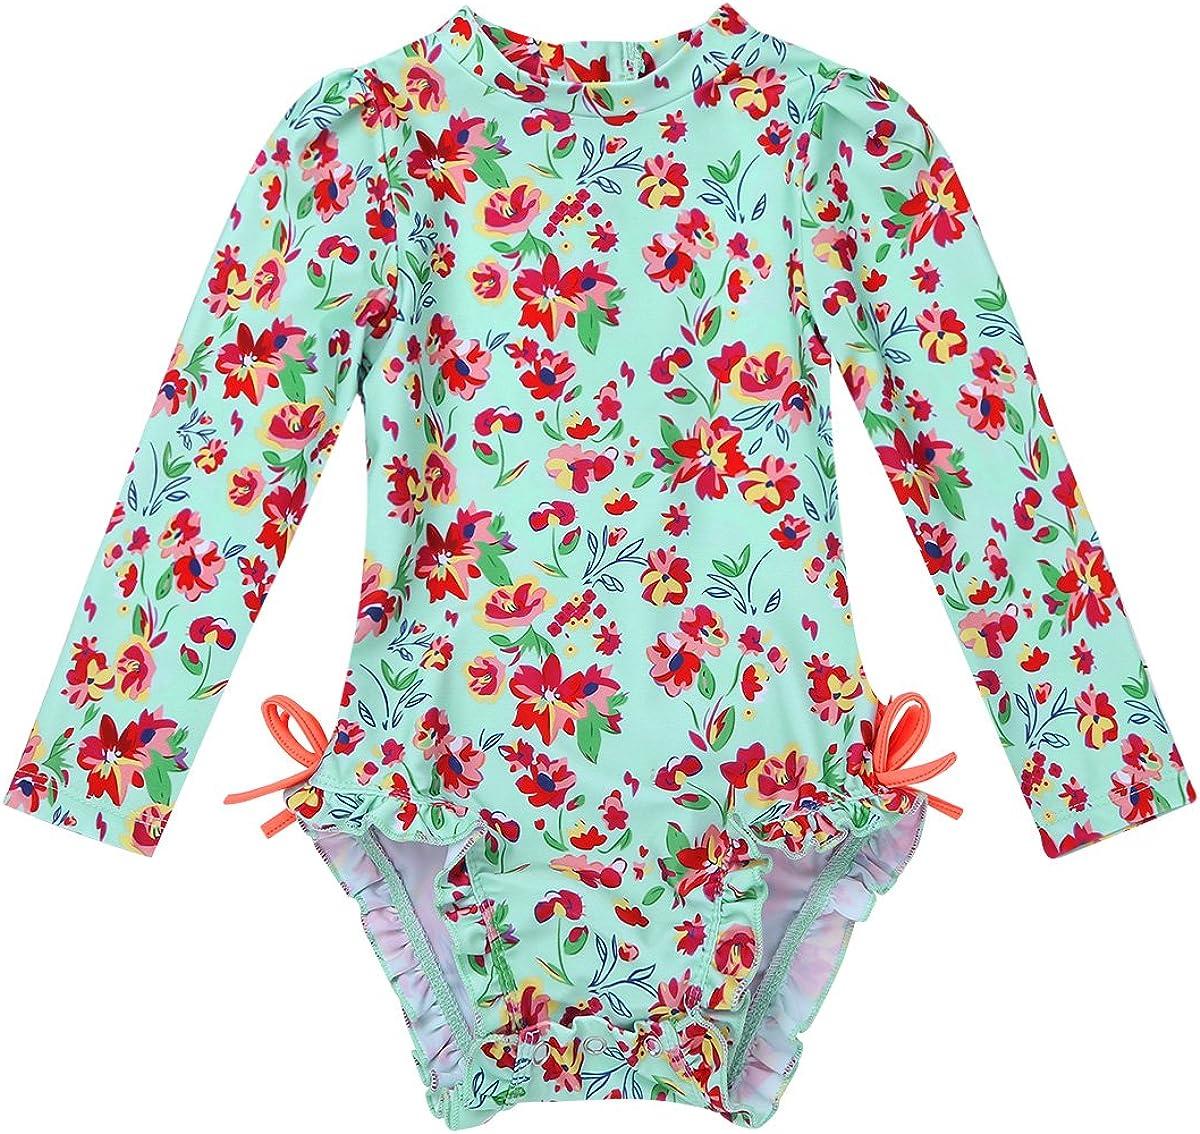 ranrann Baby Girls Long Sleeve Floral Rash Guard Sun Protection Swimwear Swimsuit Shirt UPF 50+ Zipper Back Bathing Suit